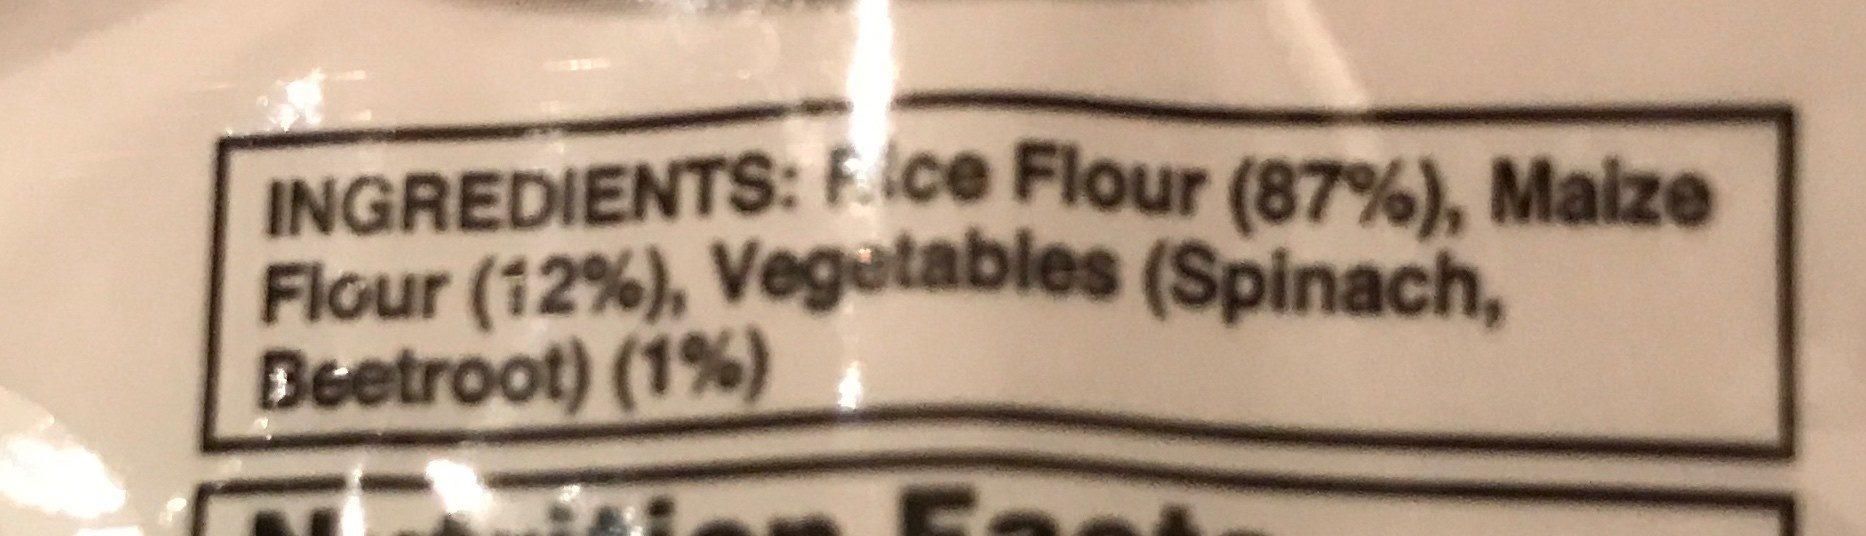 Orgran, outback animals vegetable pasta shapes - Ingredients - en